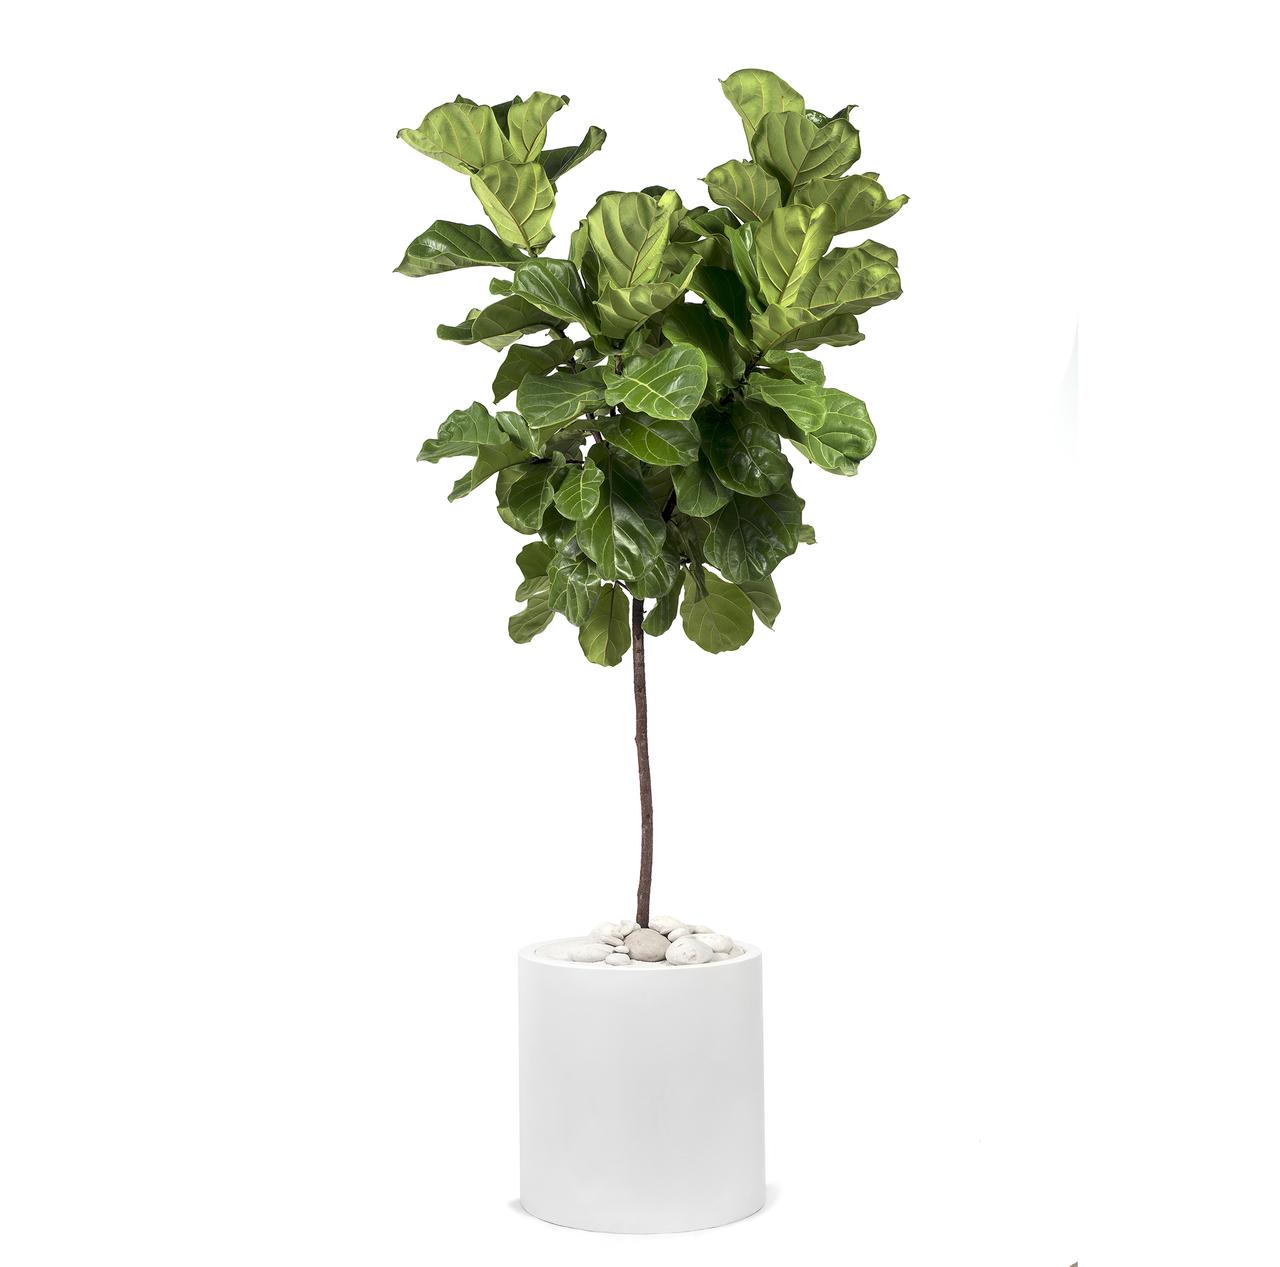 Milano Cylinder Small White – Ficus Lyrata Fiddle Leaf Tree